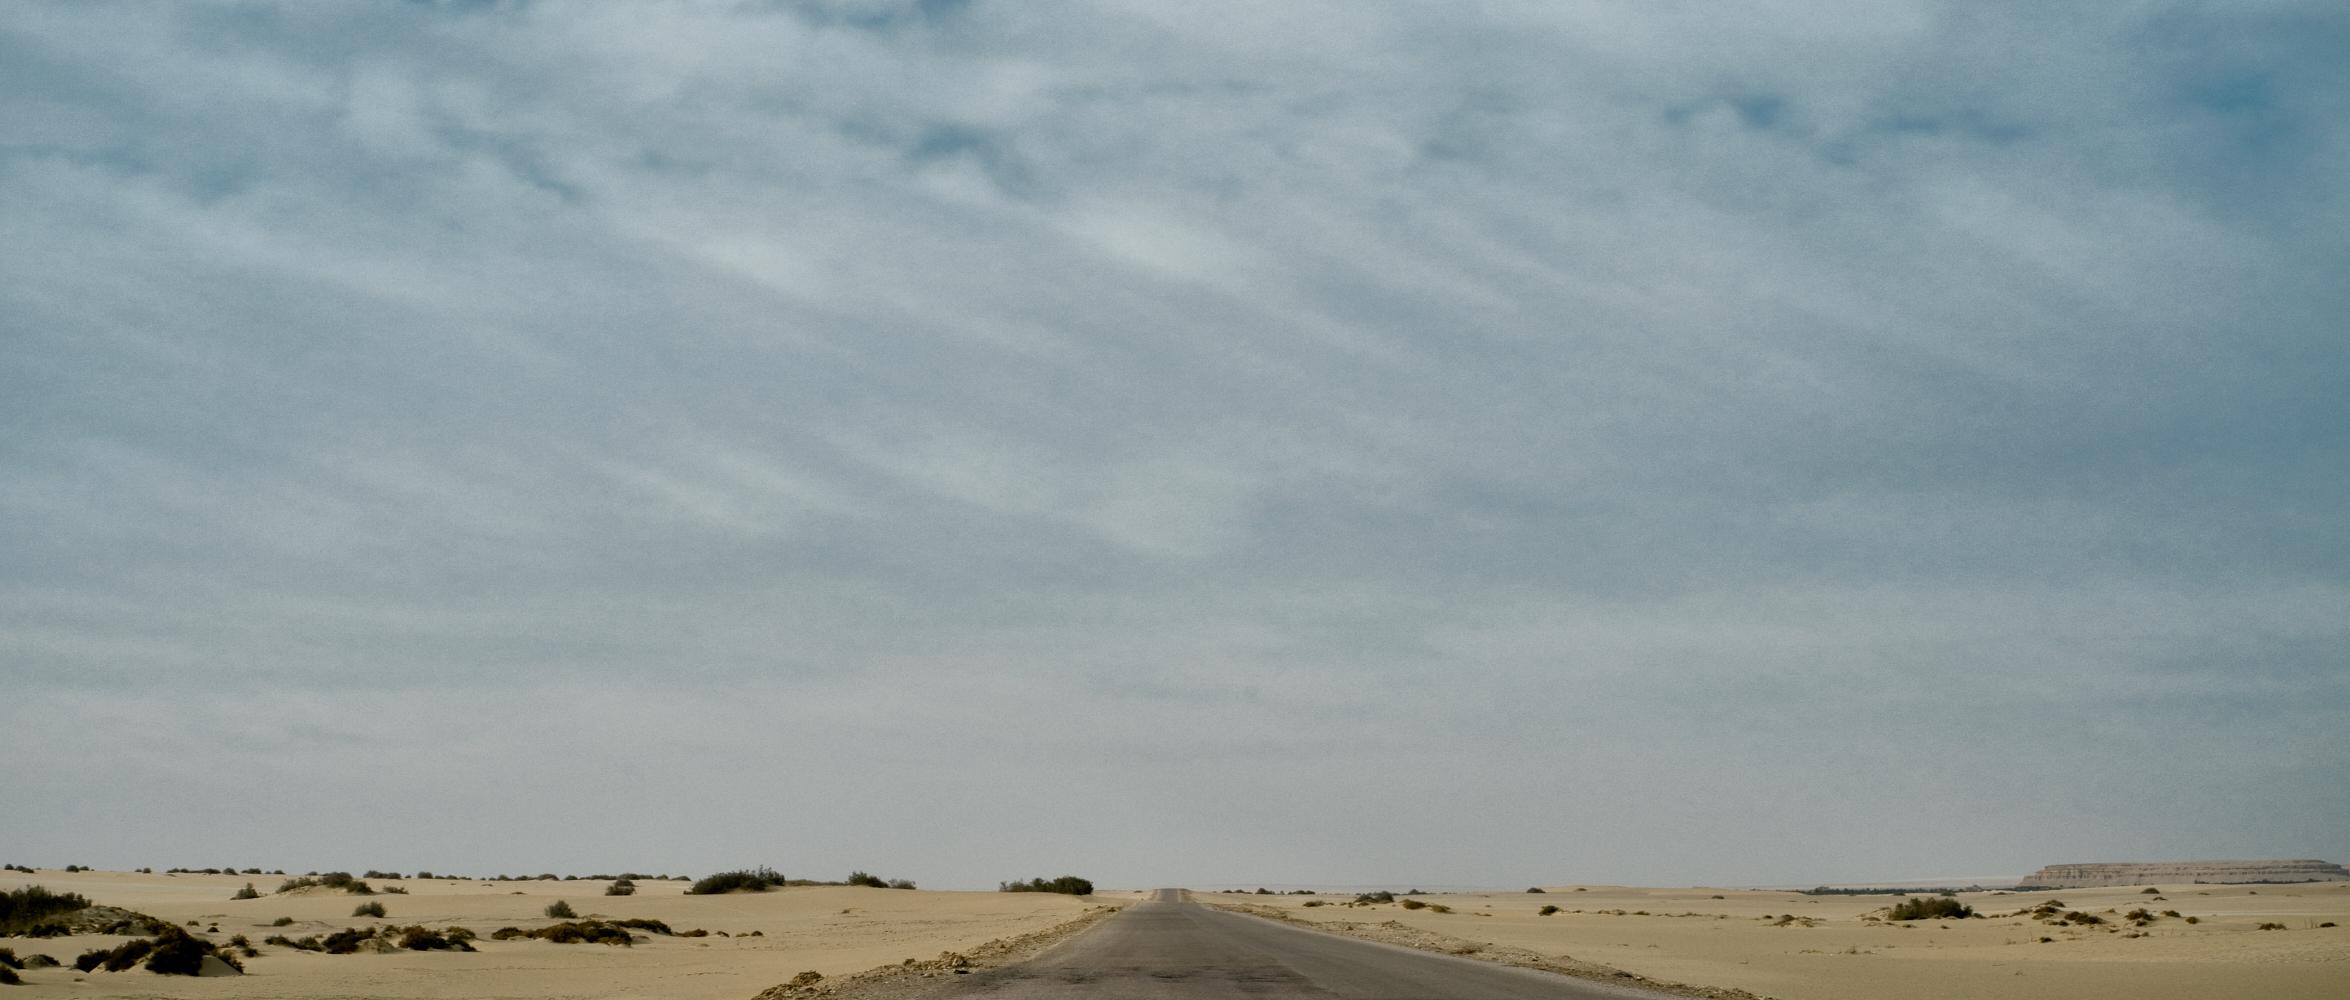 duncantelford_libyan sky.jpg